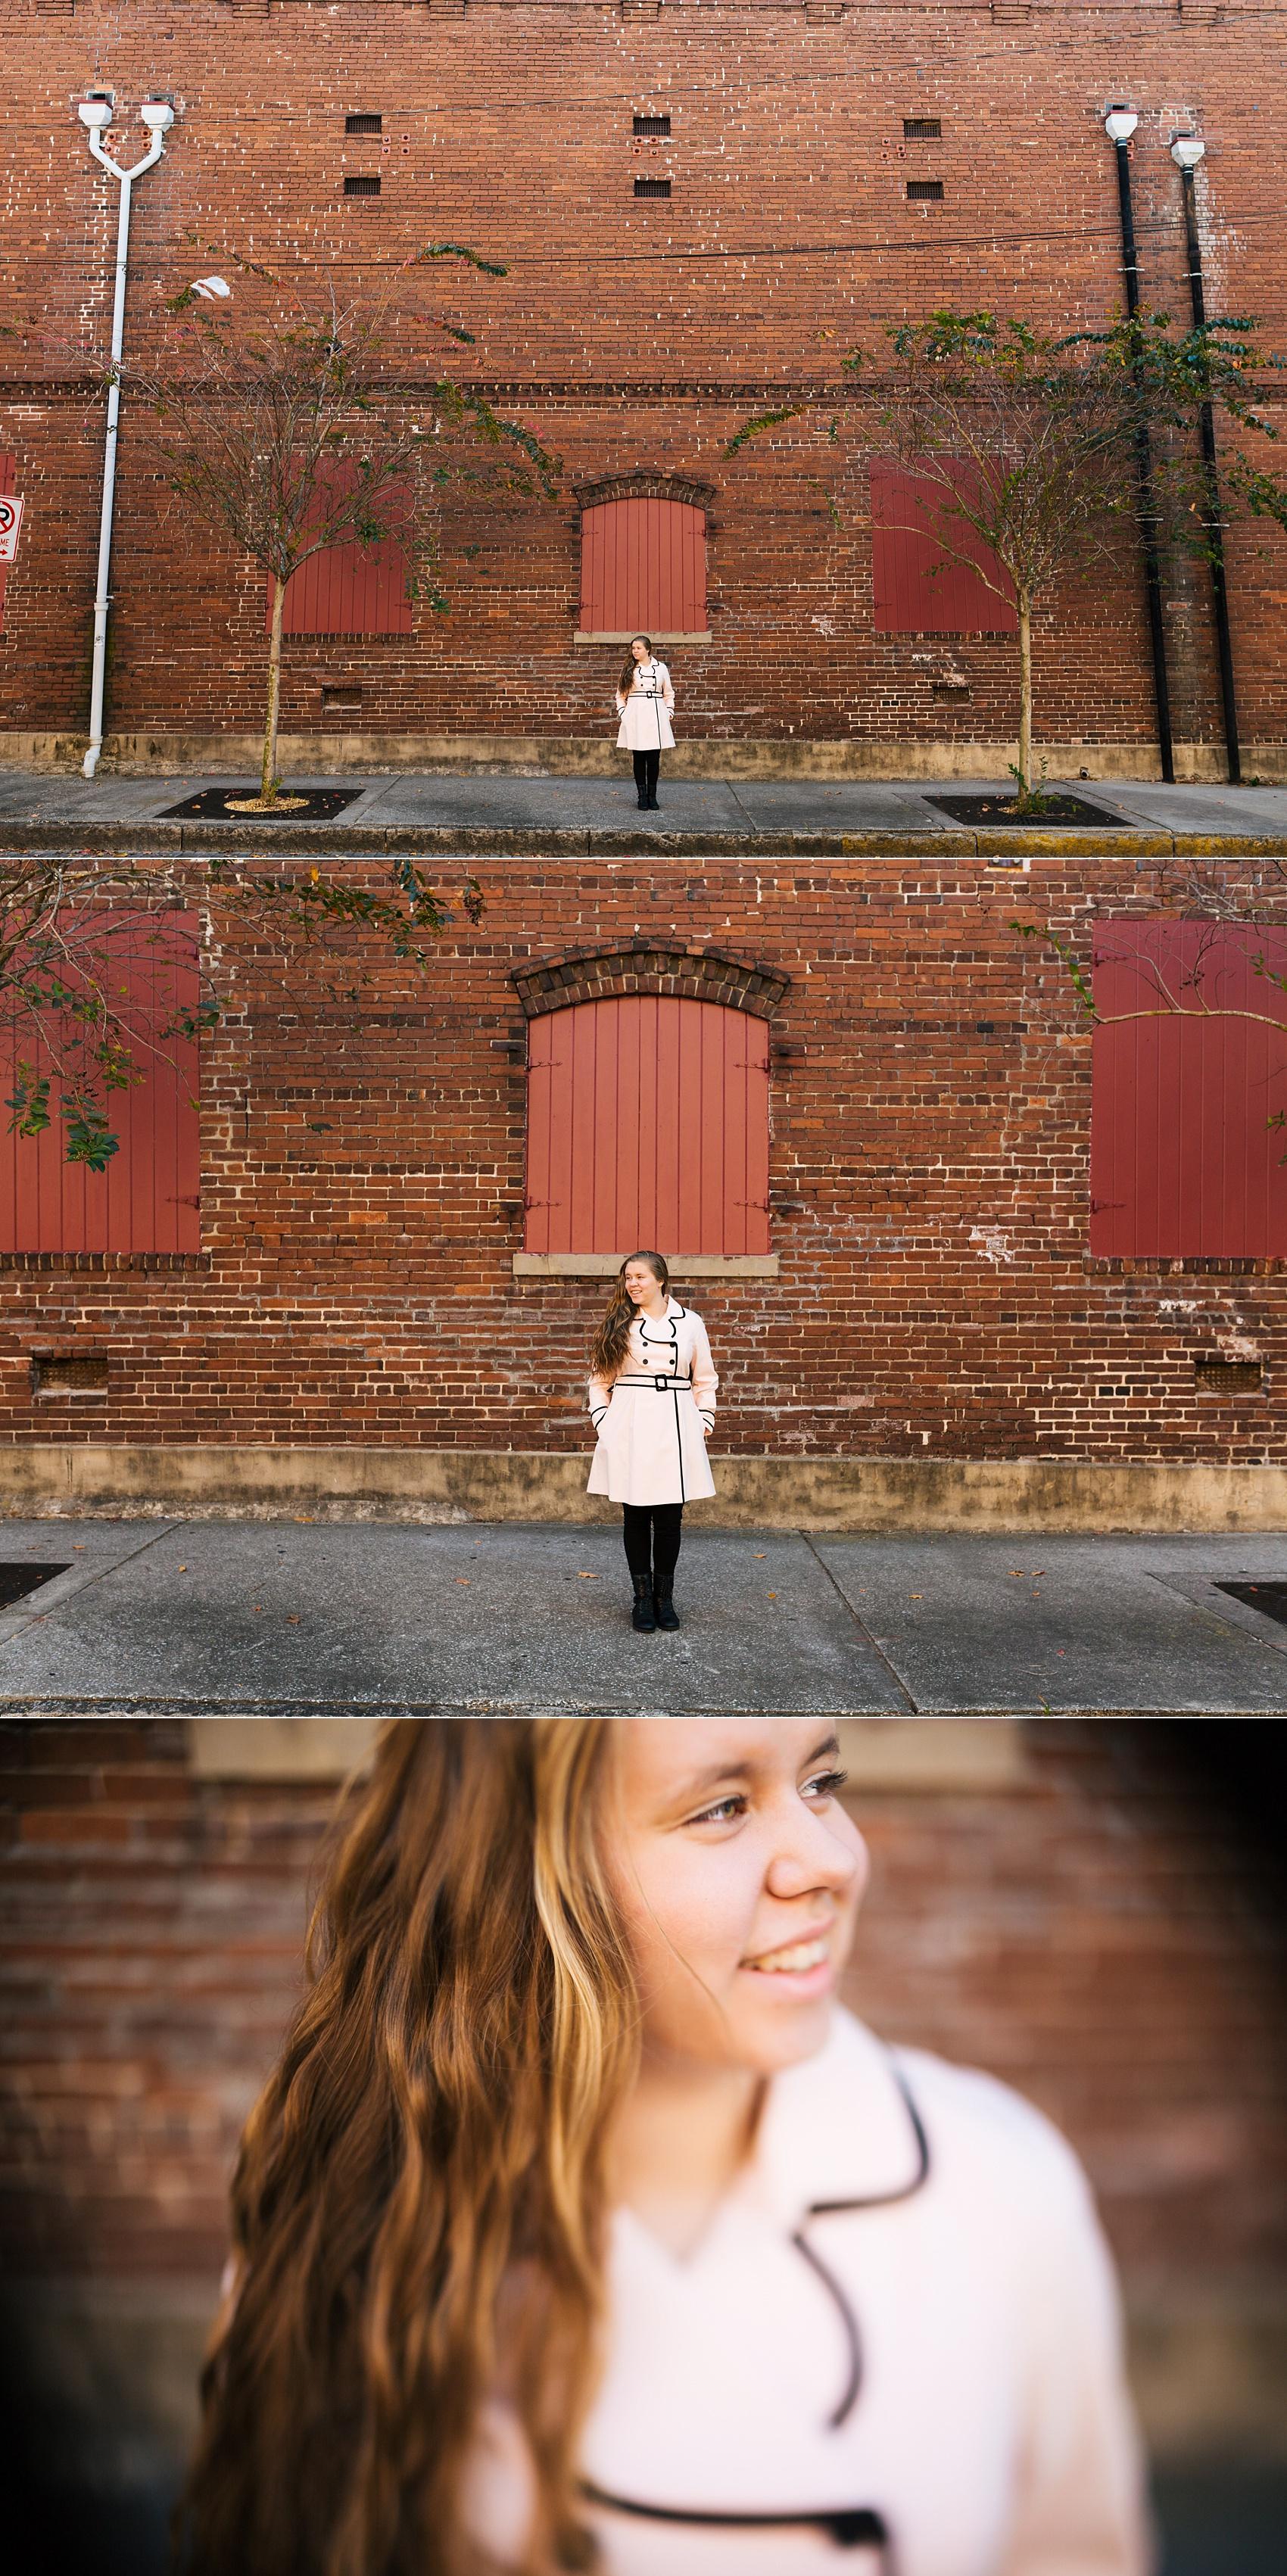 ybor city tampa senior portraits morgan-1